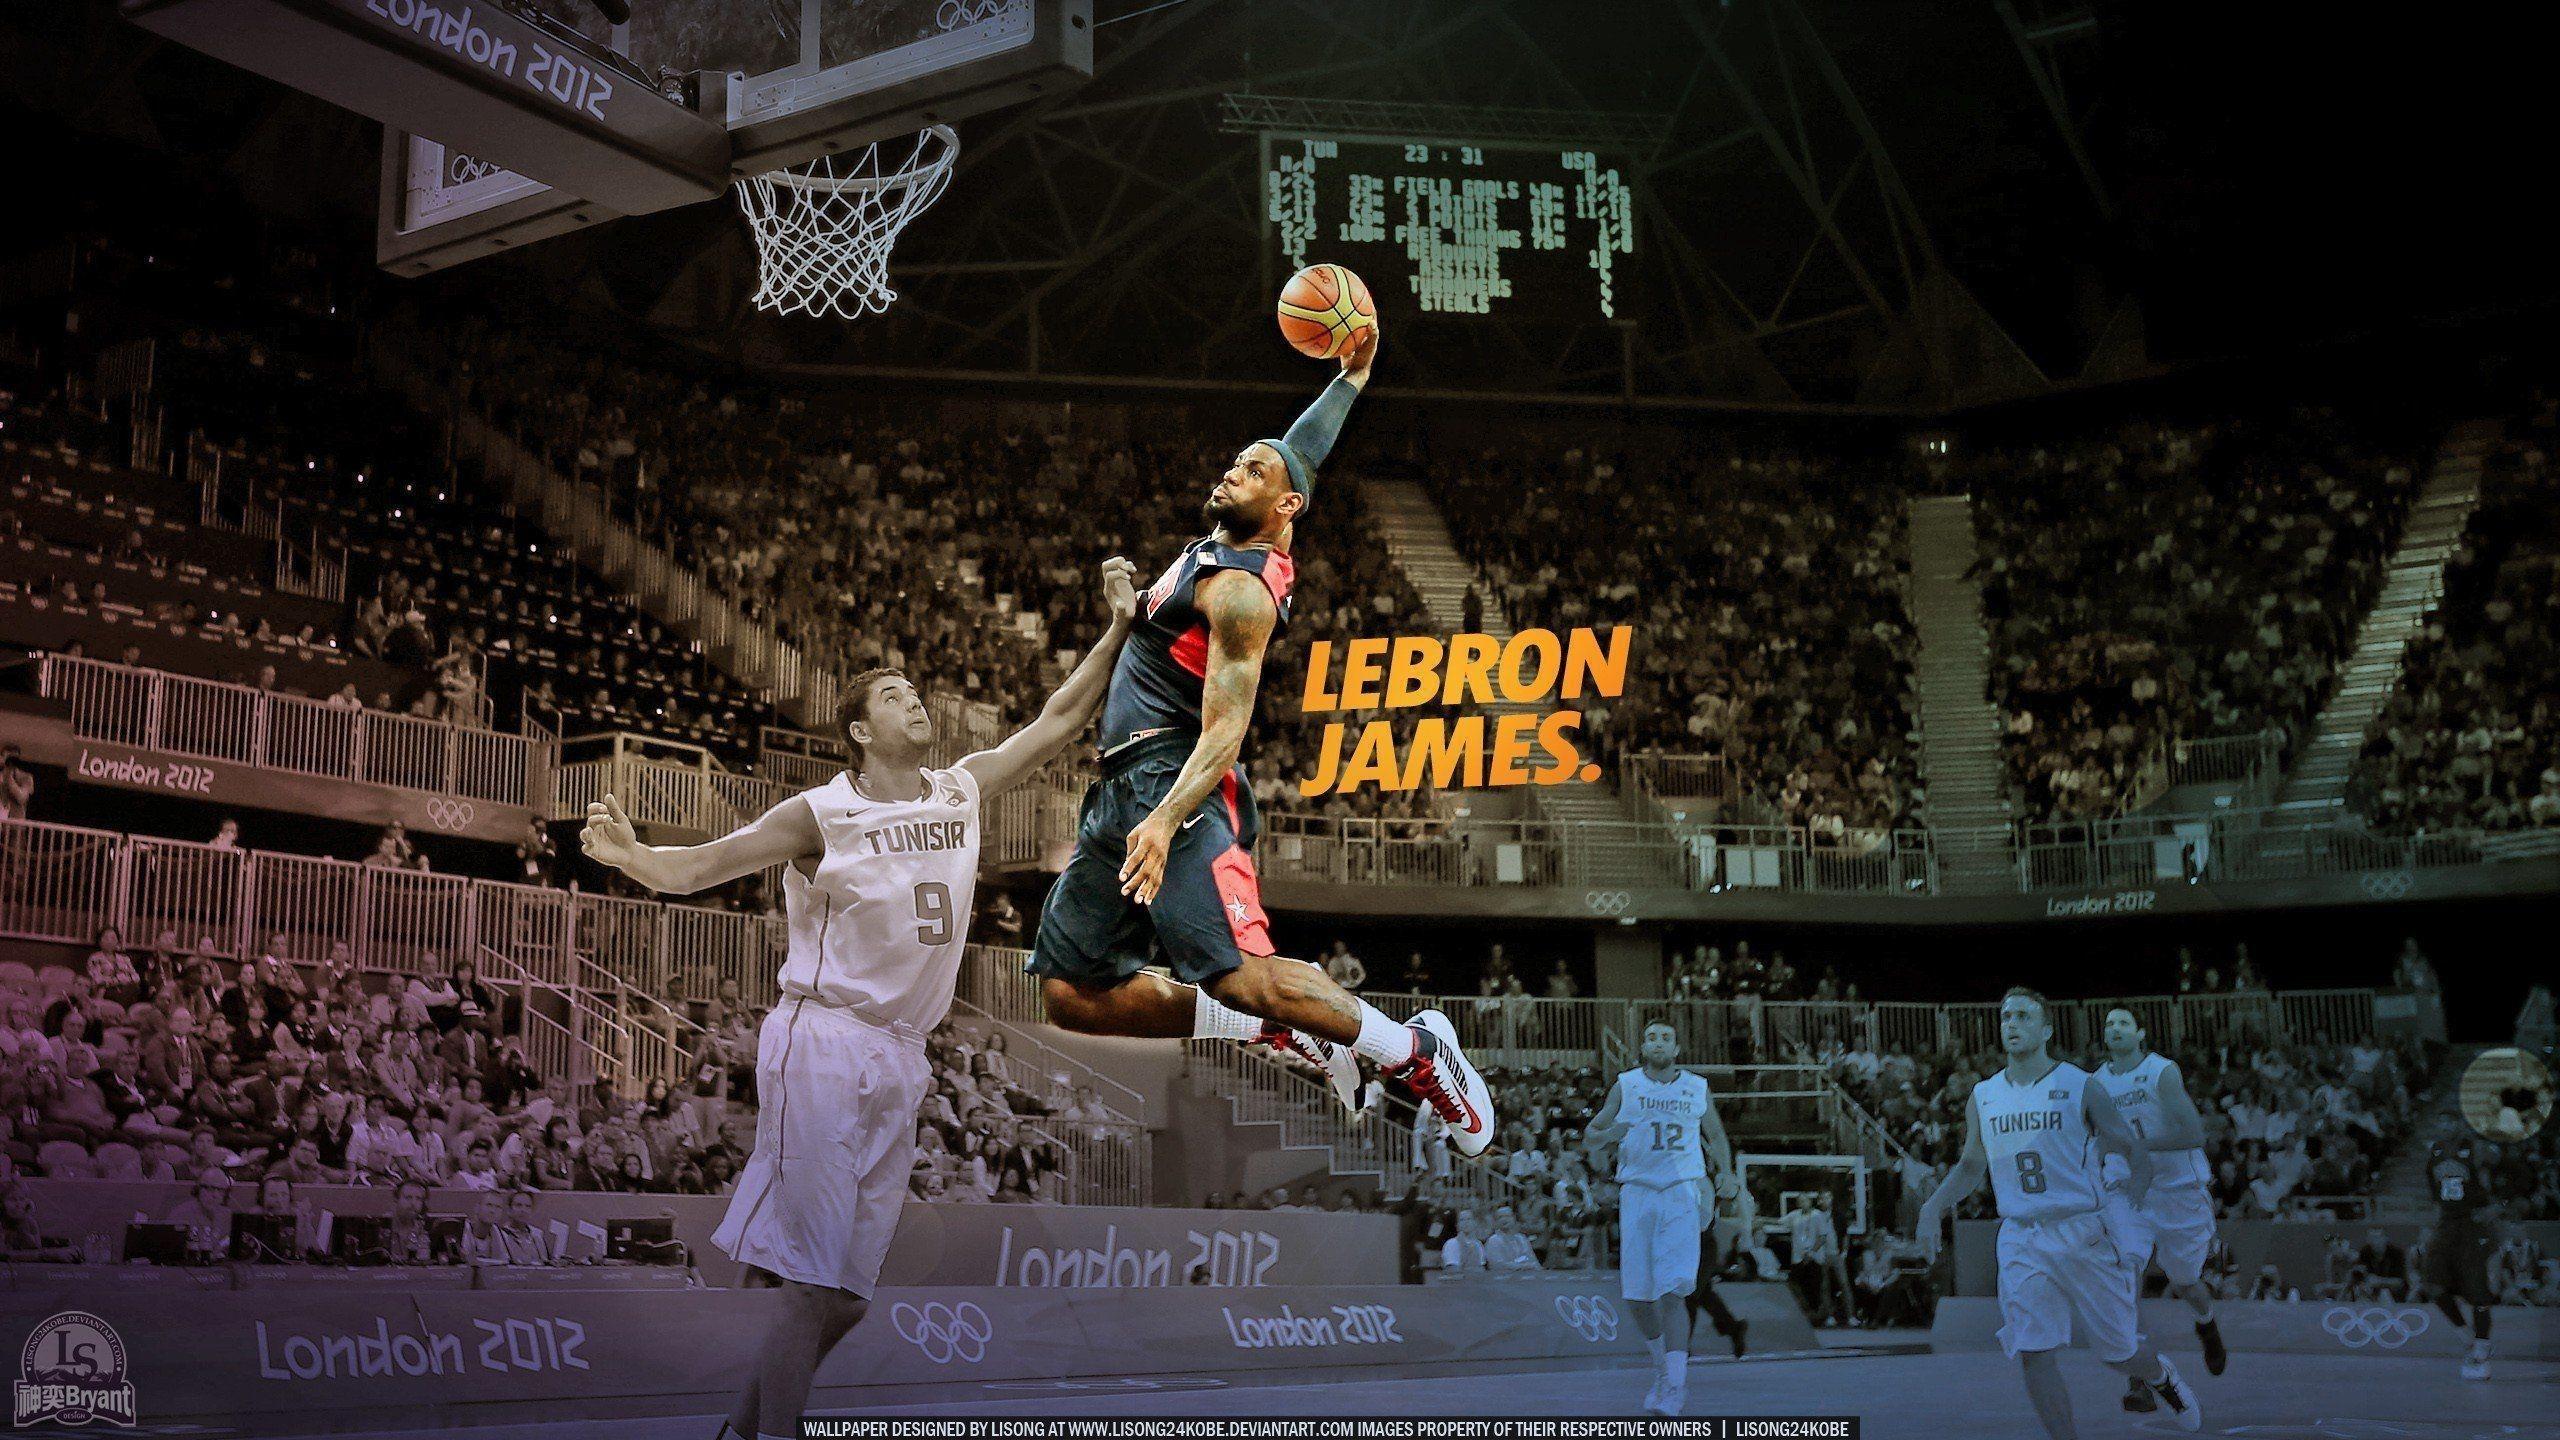 lebron james wallpapers dunk 2016 - wallpaper cave